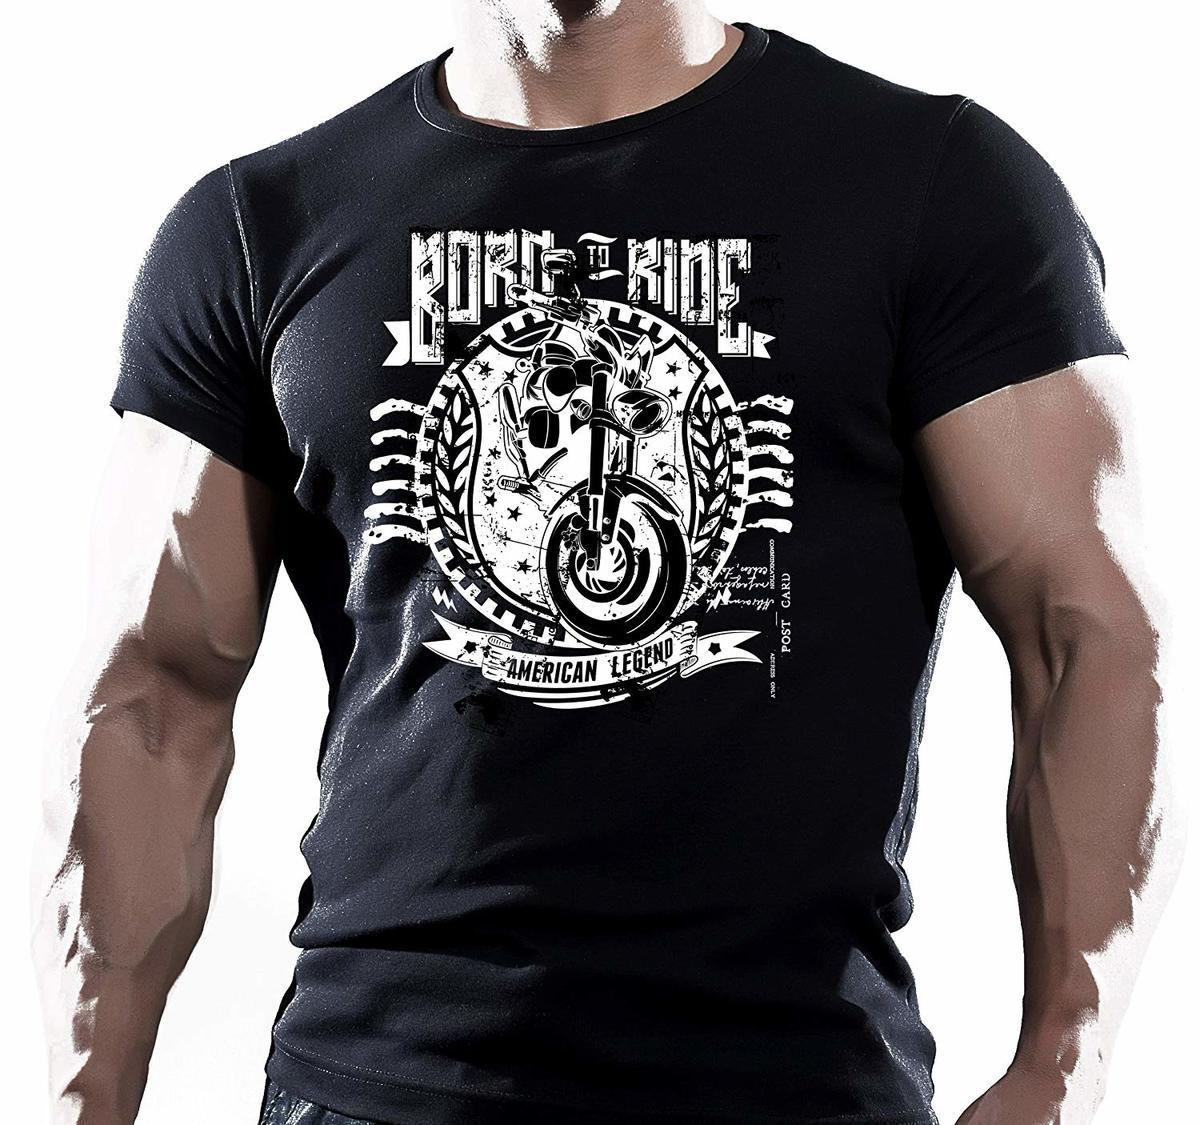 c00a9bec4 Born To Ride Cotton T Shirt Top Clothing Biker Motorbike Superbike Biker'S  Gift Print T Shirt Men Summer Top Tee Plus Size Rude Tshirts Offensive Tee  Shirts ...